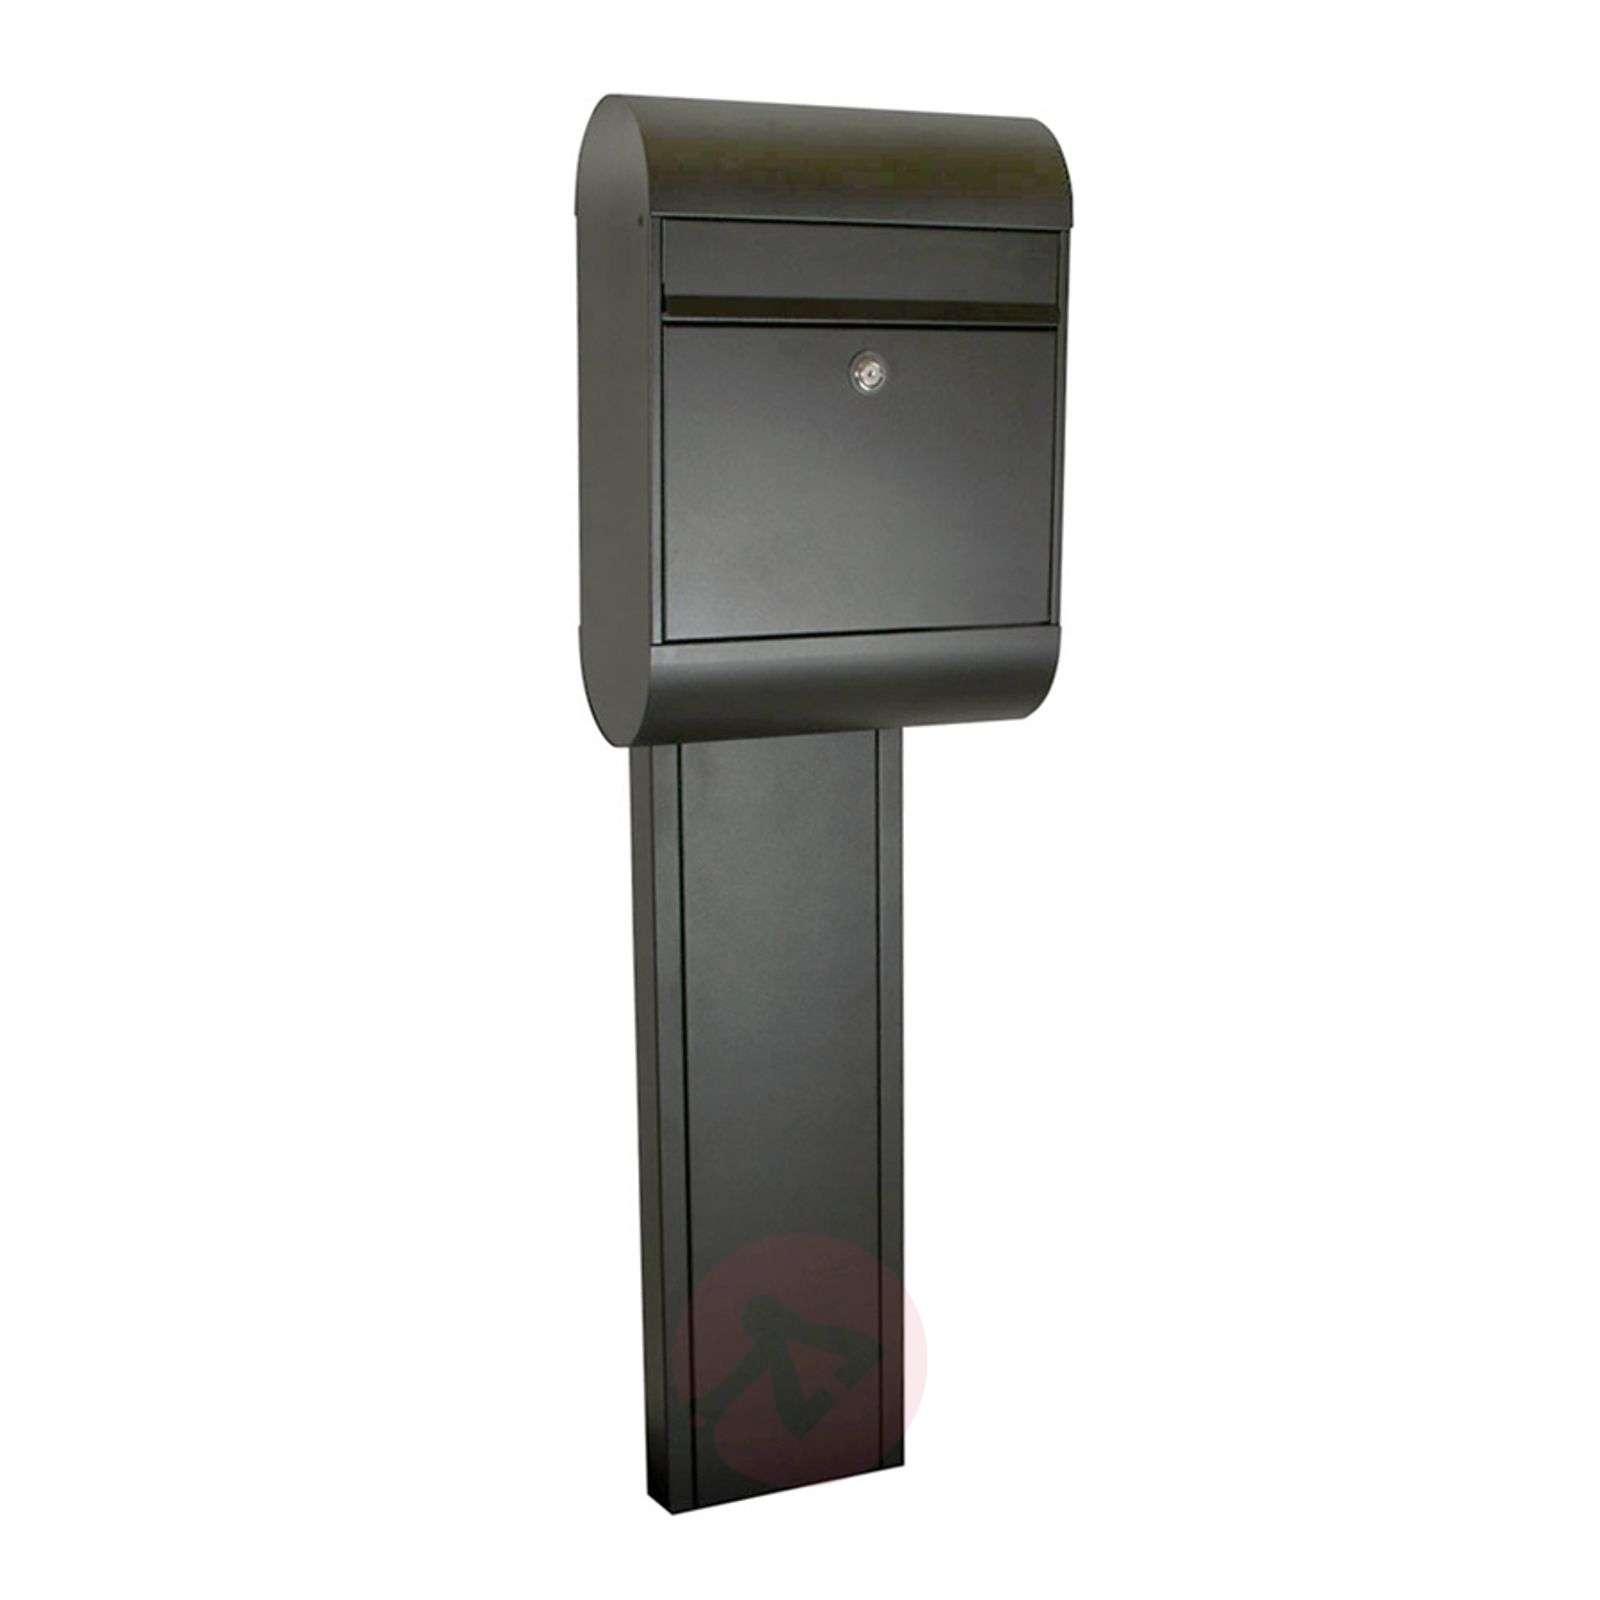 mLovely ailbox 5000-1045031X-01